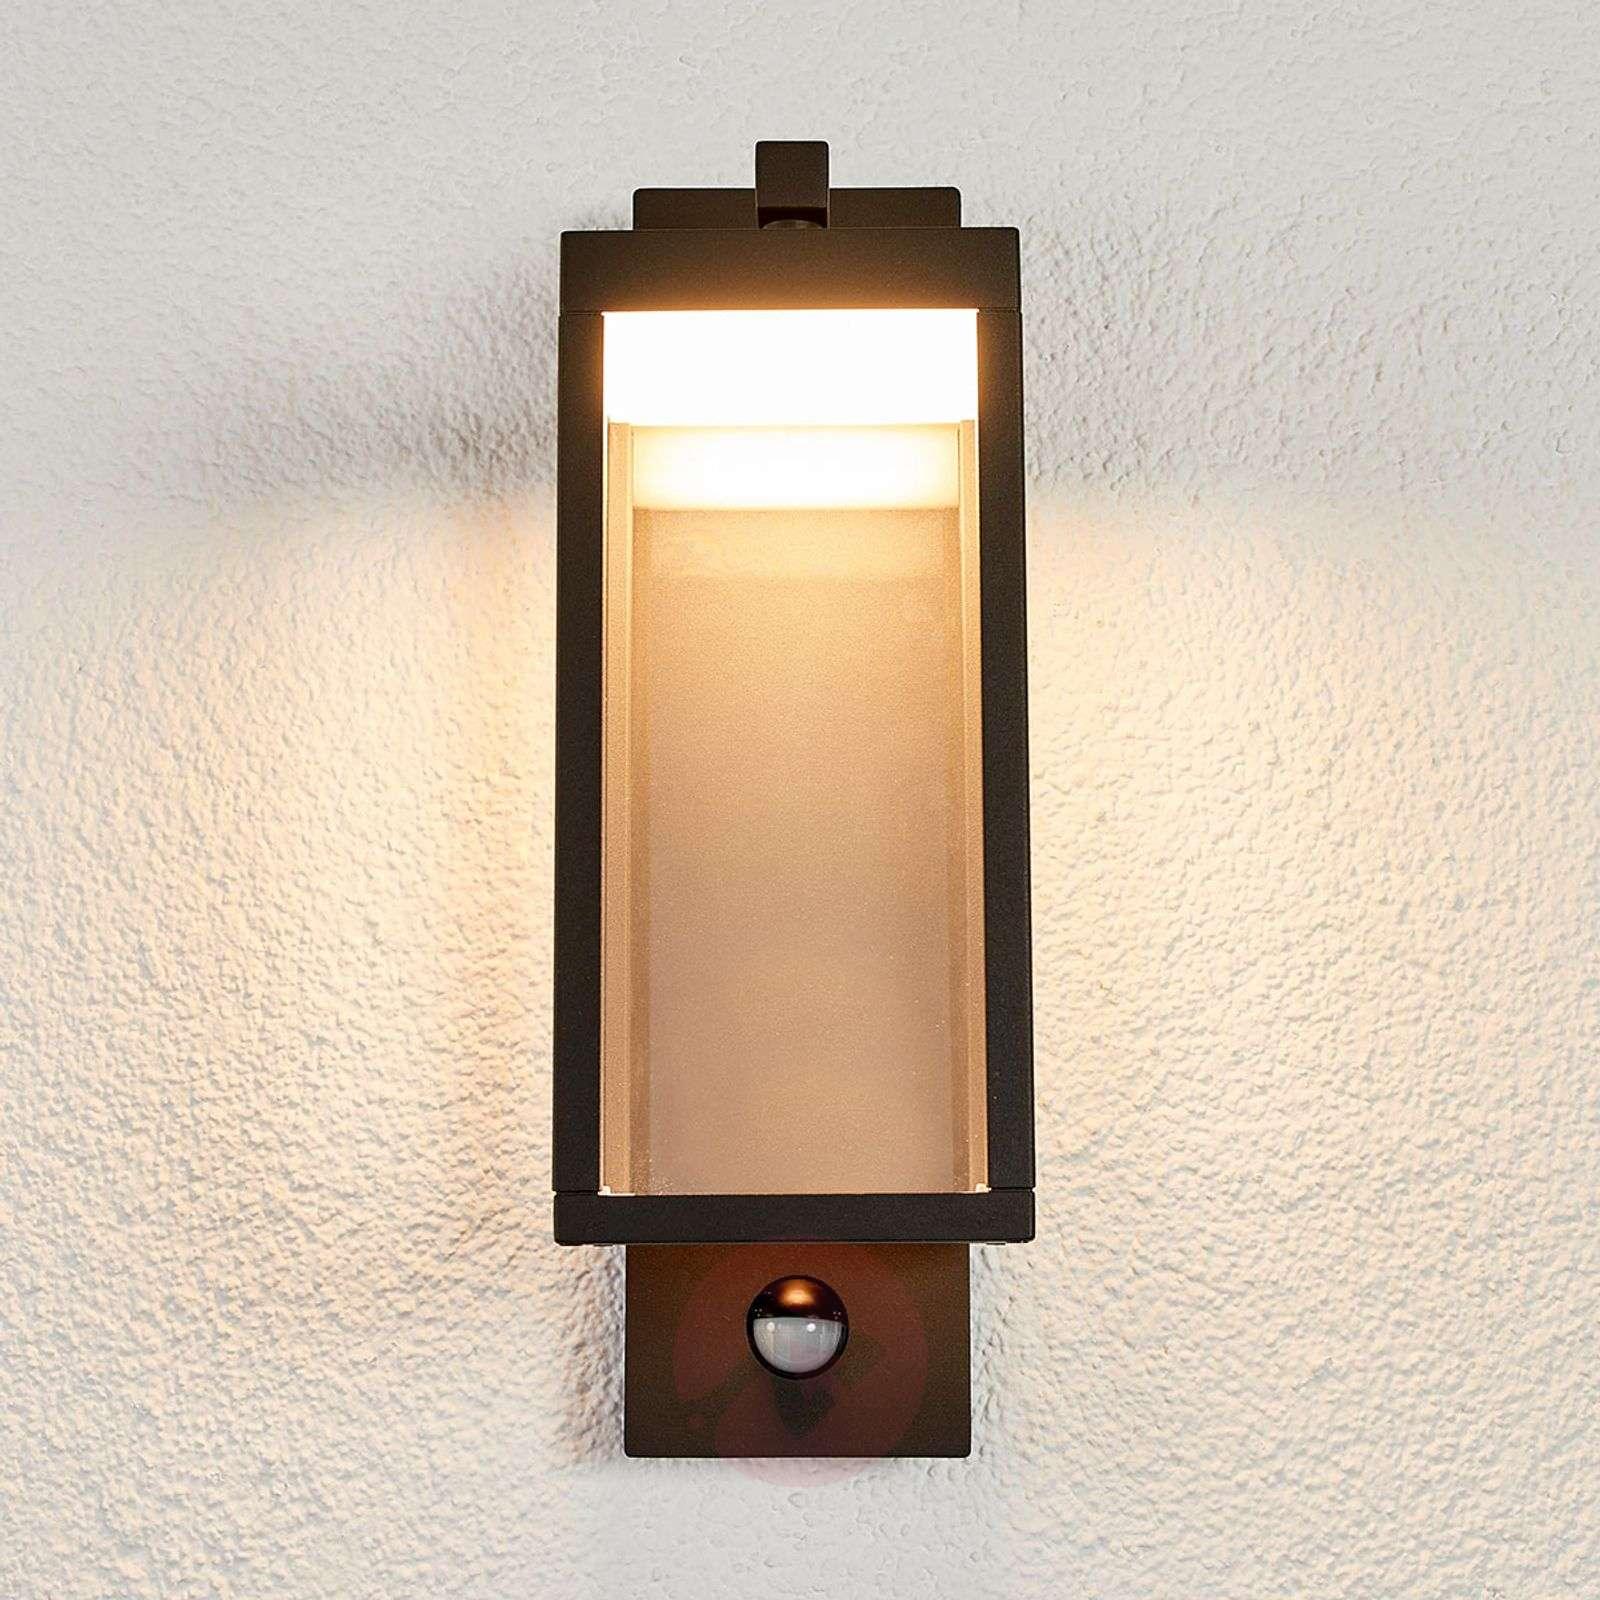 Ferdinand motion sensor outdoor wall lamp, LED-9619150-03